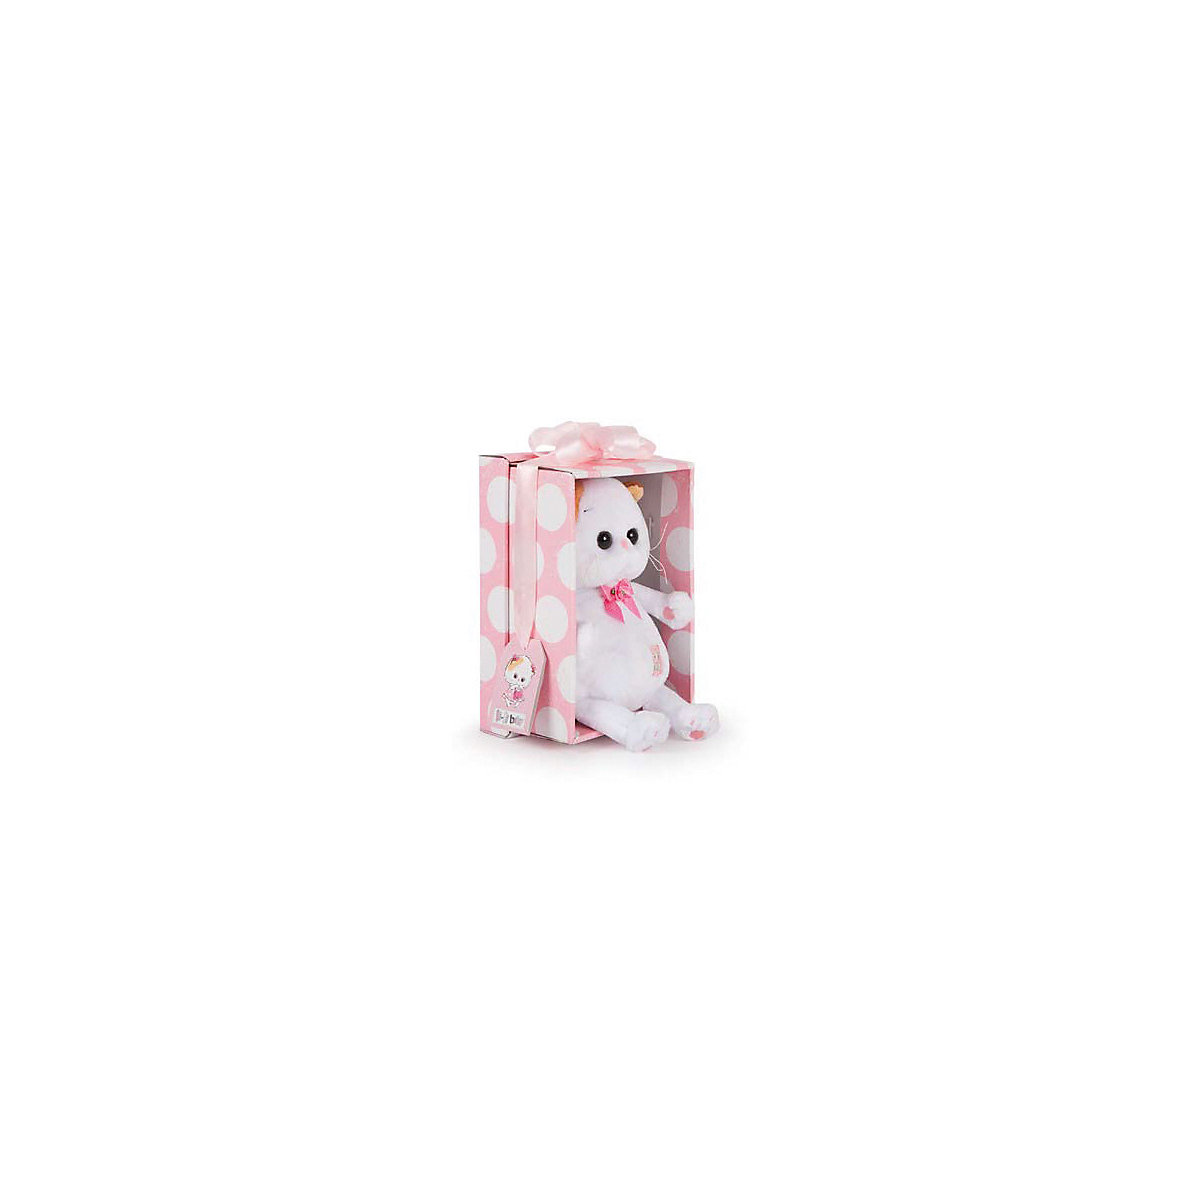 Stuffed & Plush Animals BUDI BASA 8999611 Stitch Bear Totoro Giraffe Fox Cat Dog Soft Children\'s toys MTpromo - 5